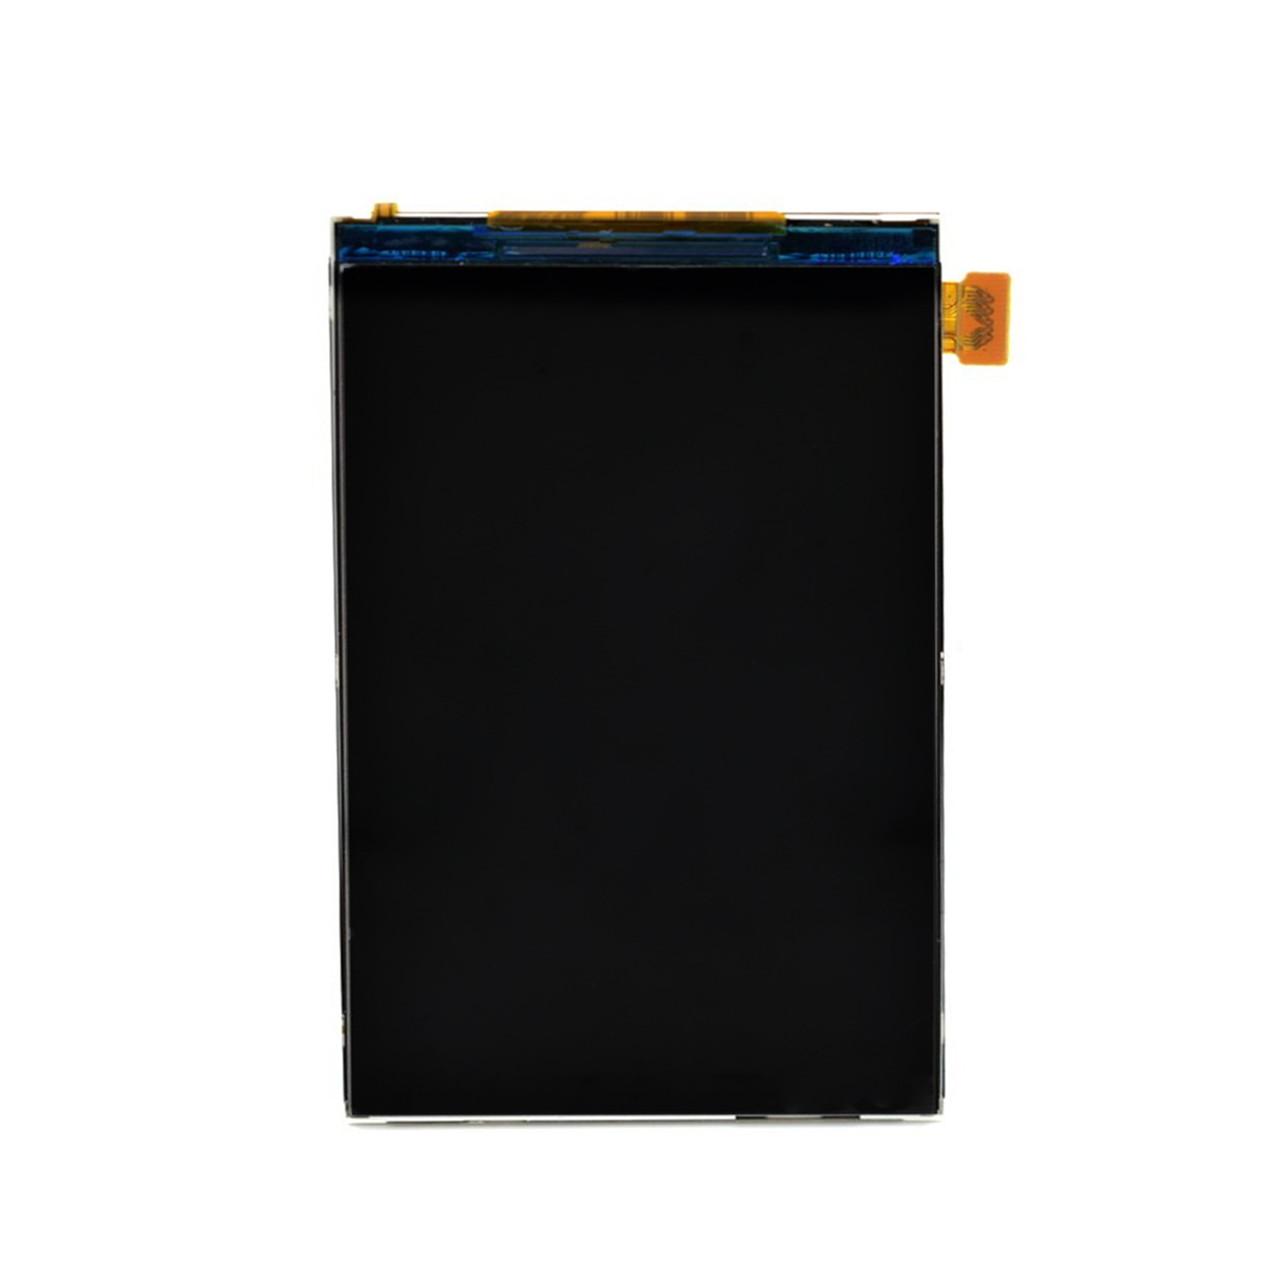 Дисплей Samsung Galaxy Ace 4 G313F узкий коннектор (28)